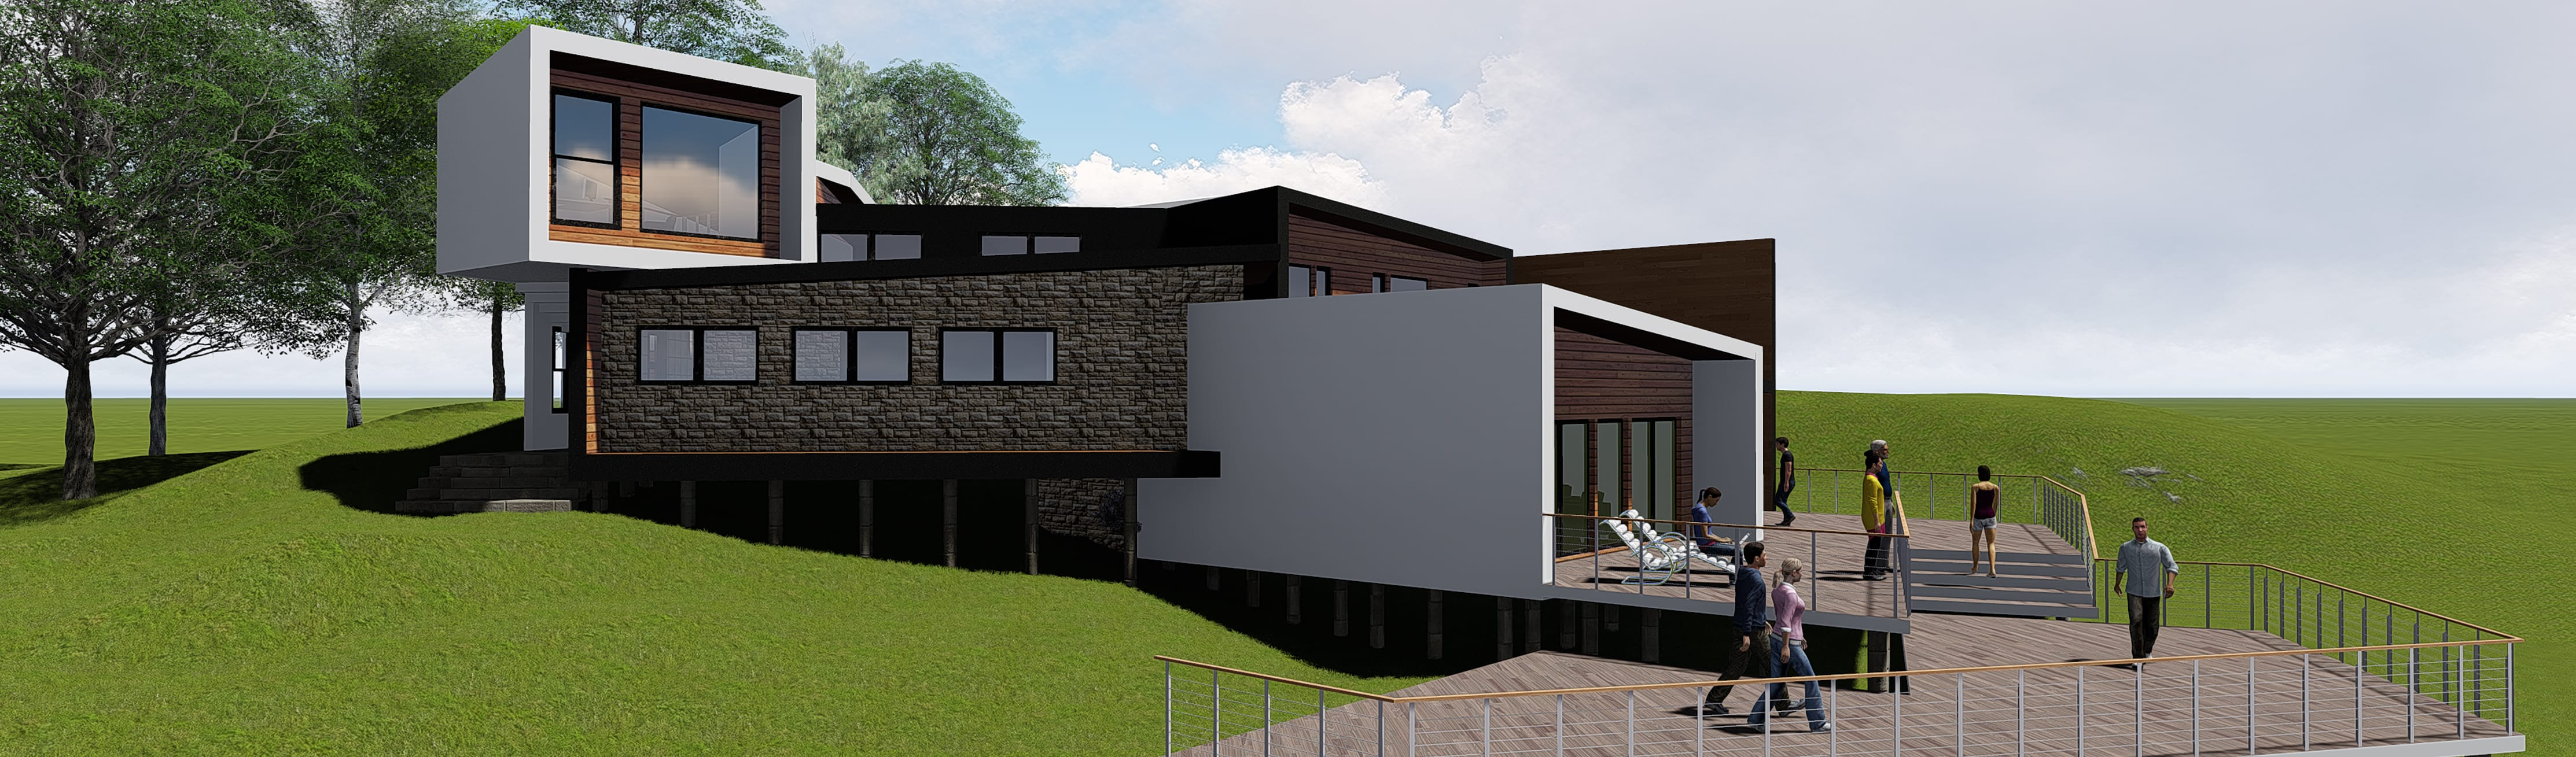 GerSS Arquitectos